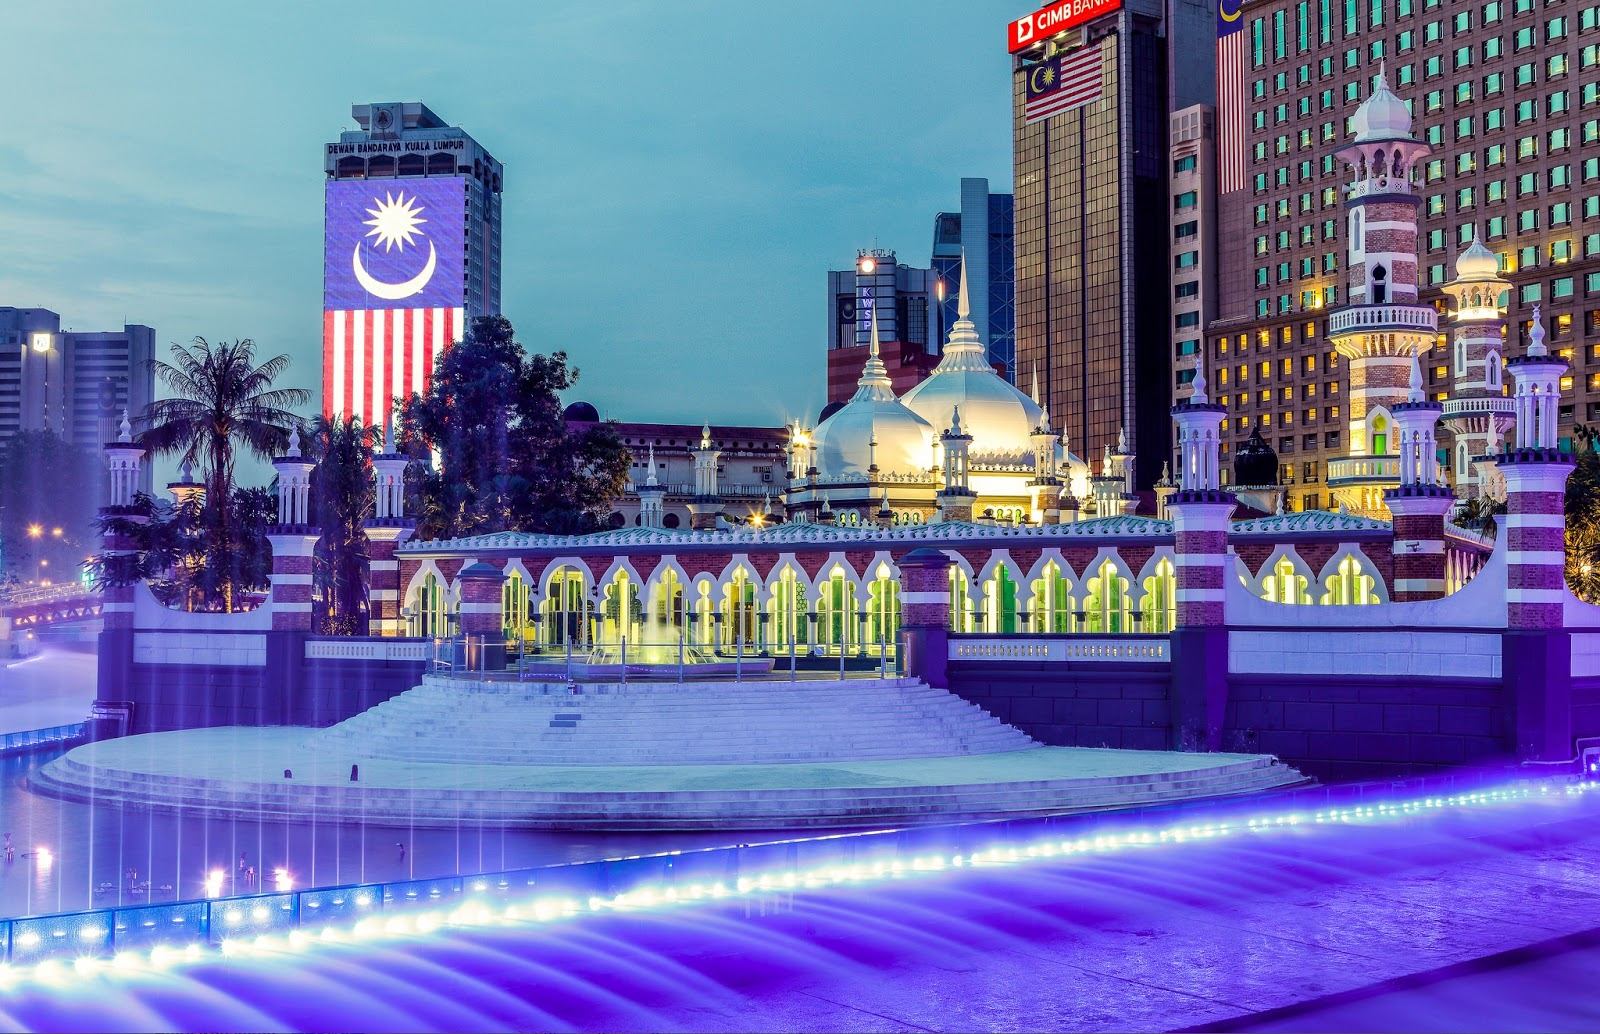 Negara ku hebat, keindahan Kolam Biru nyata mempesona _ RIVER OF LIFE by Najib Razak _ 01